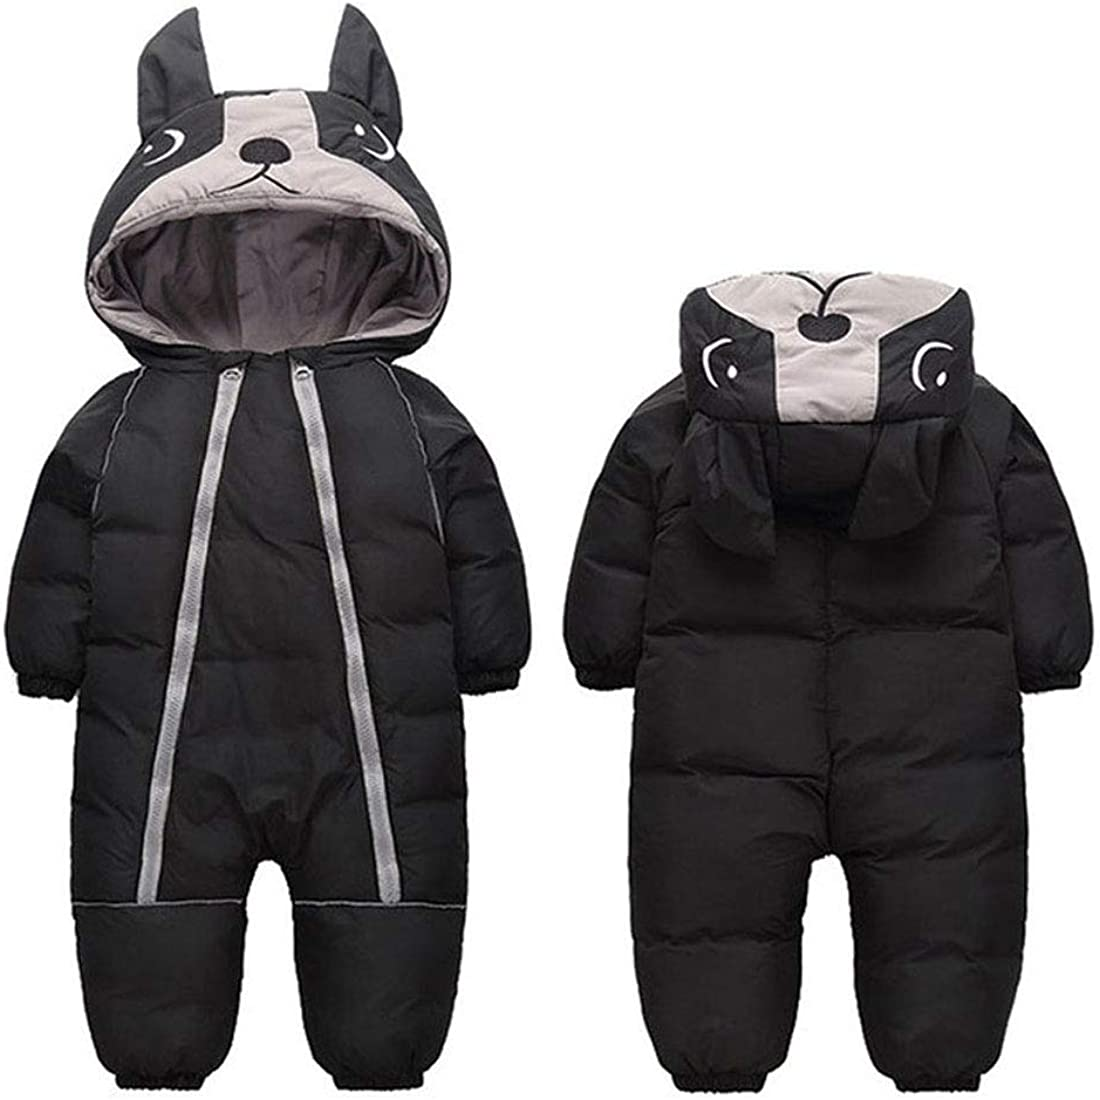 ALLAIBB Toddler Infant Baby Boy Girl Winter Snowsuit Coat Thick Onesie Romper Outwear Warm Hood Snow Suit Jumpsuit for 1-4T